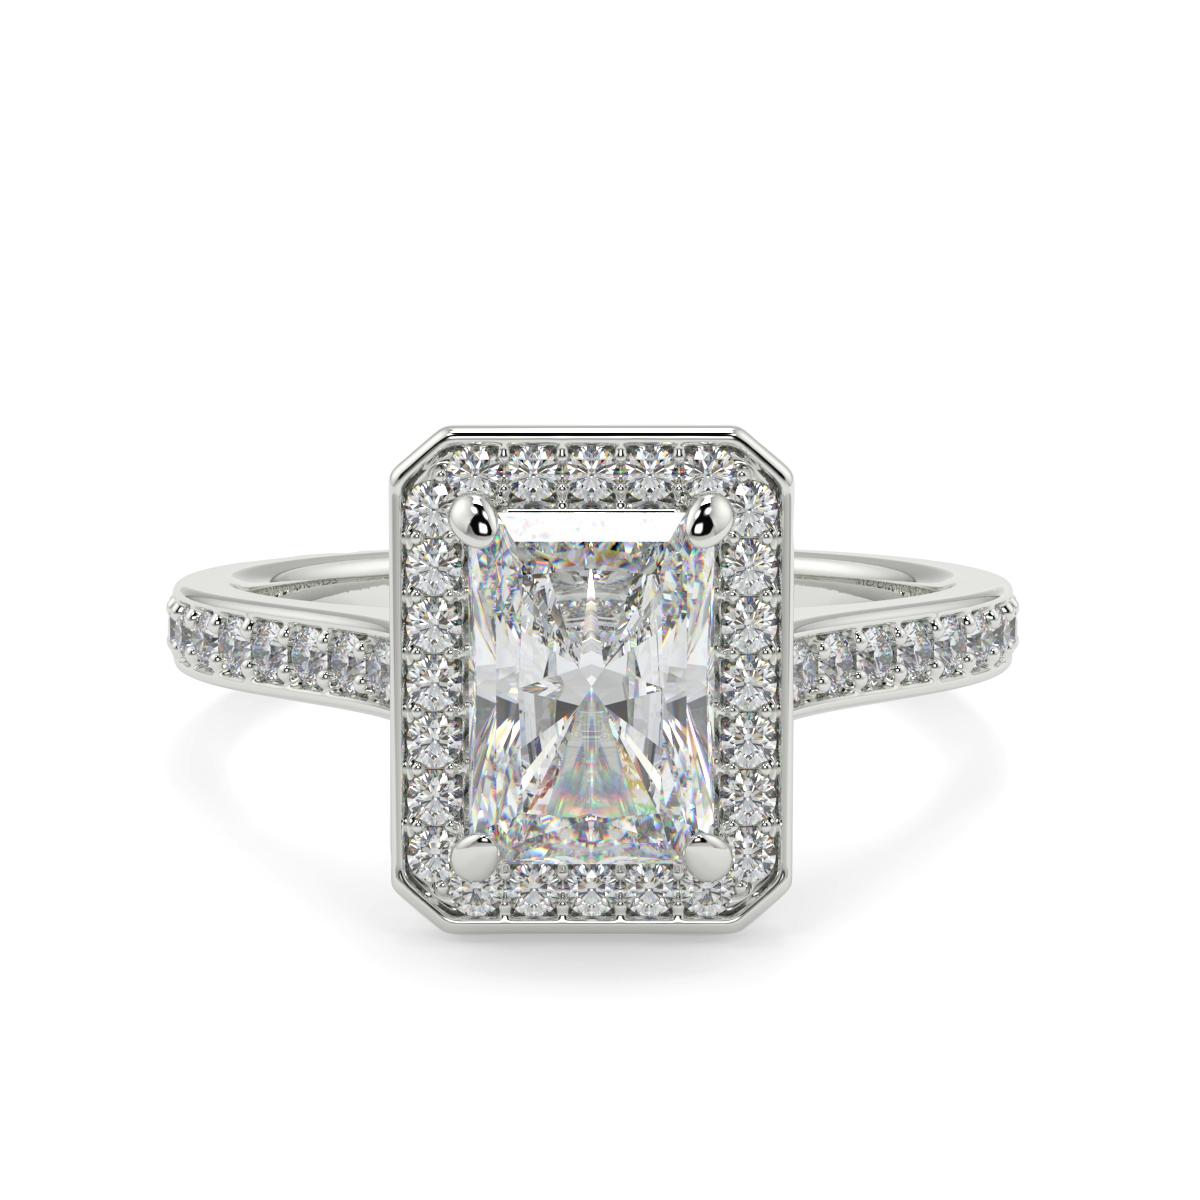 Radiant Pave Set Halo Ring